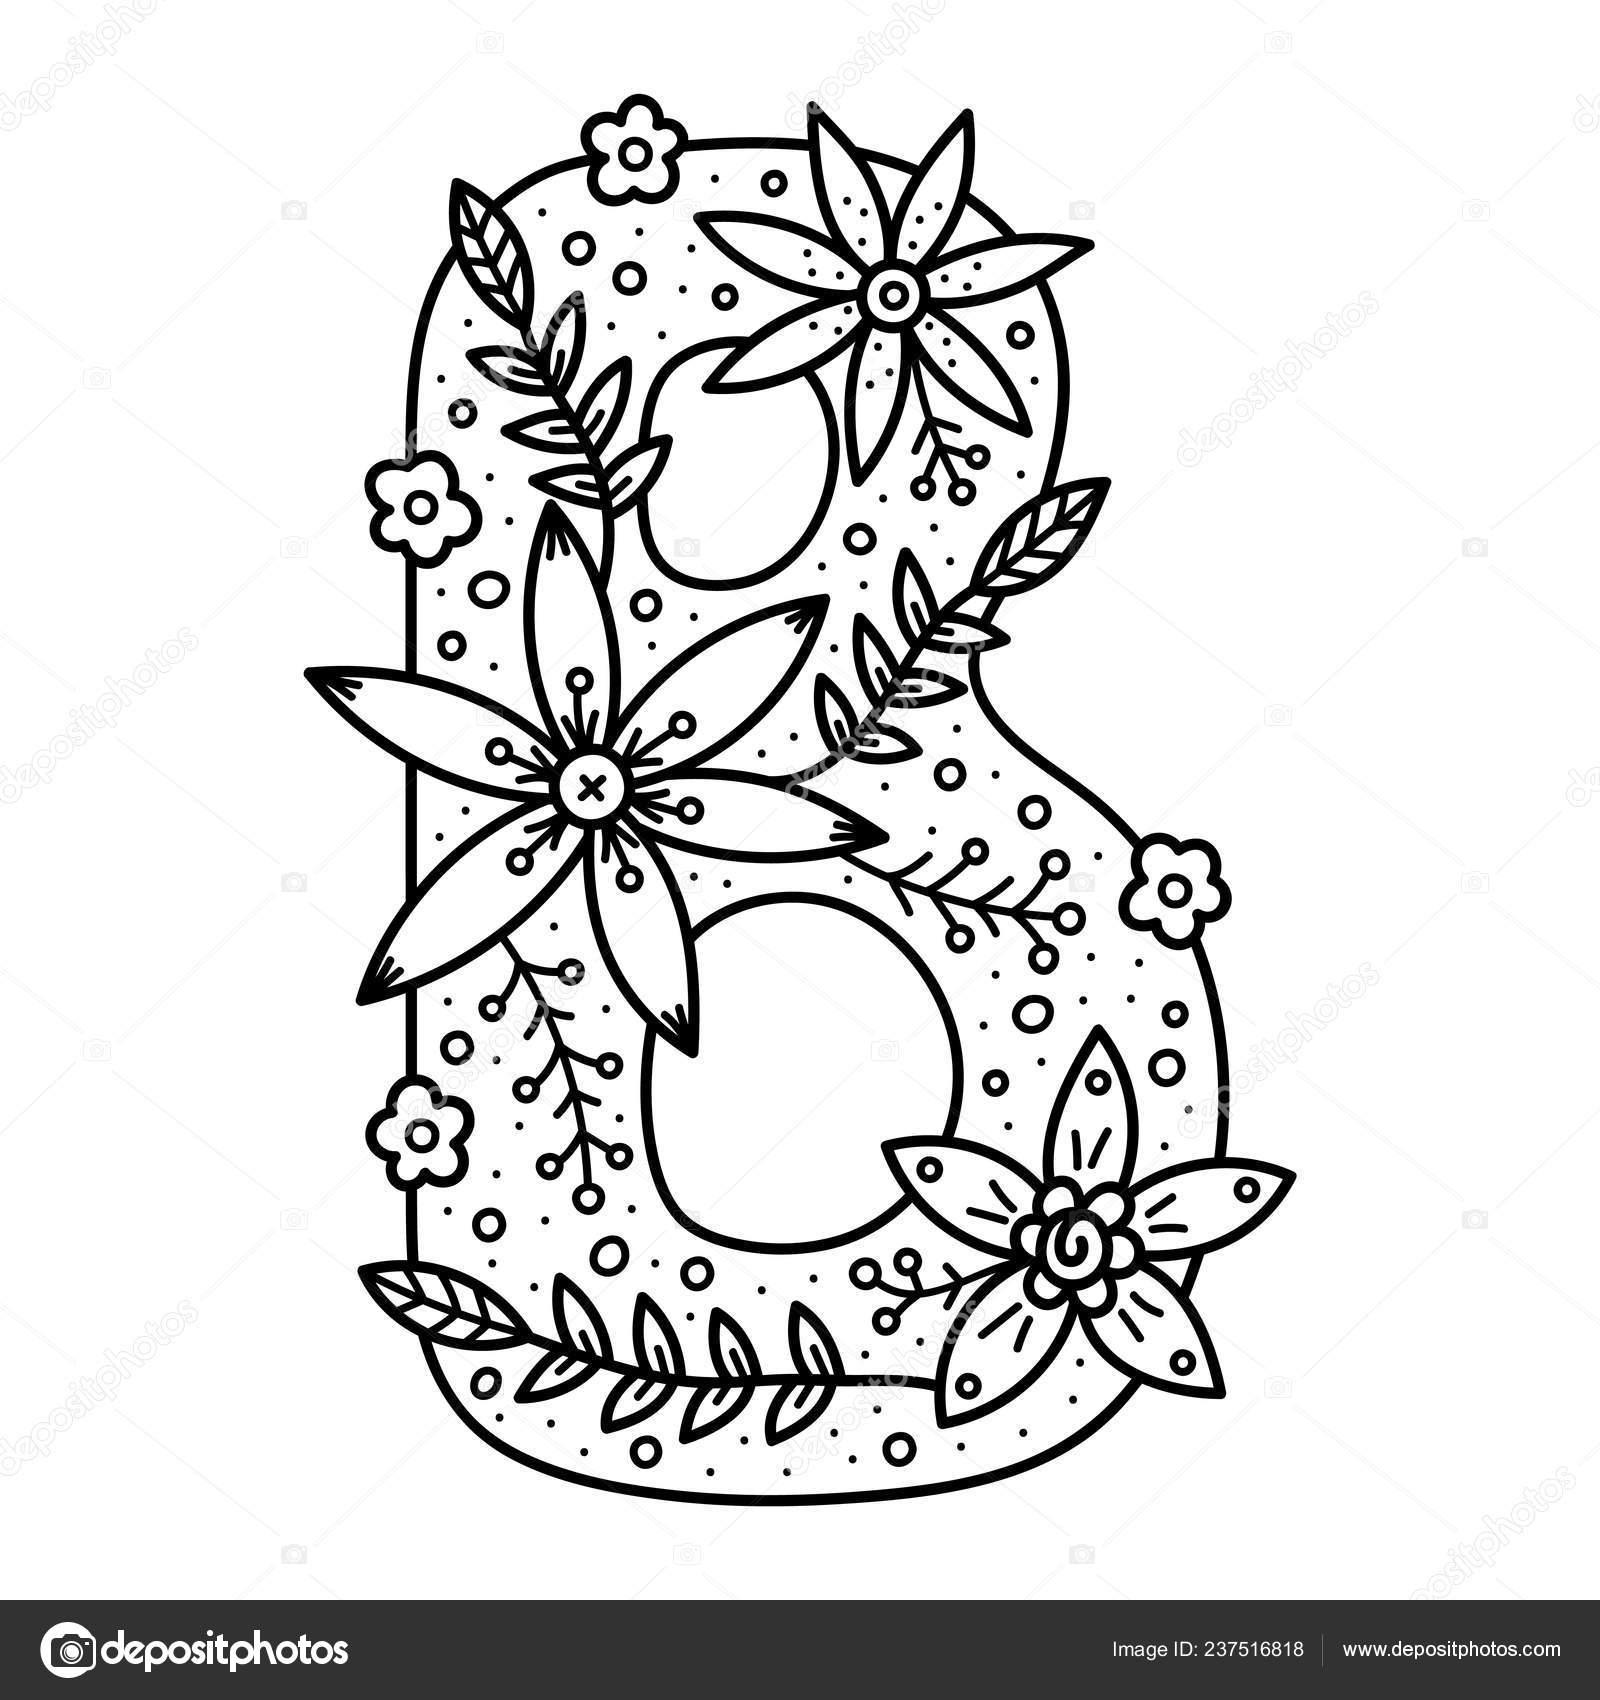 Floral Alphabet Black White Doodle Letter Coloring Book